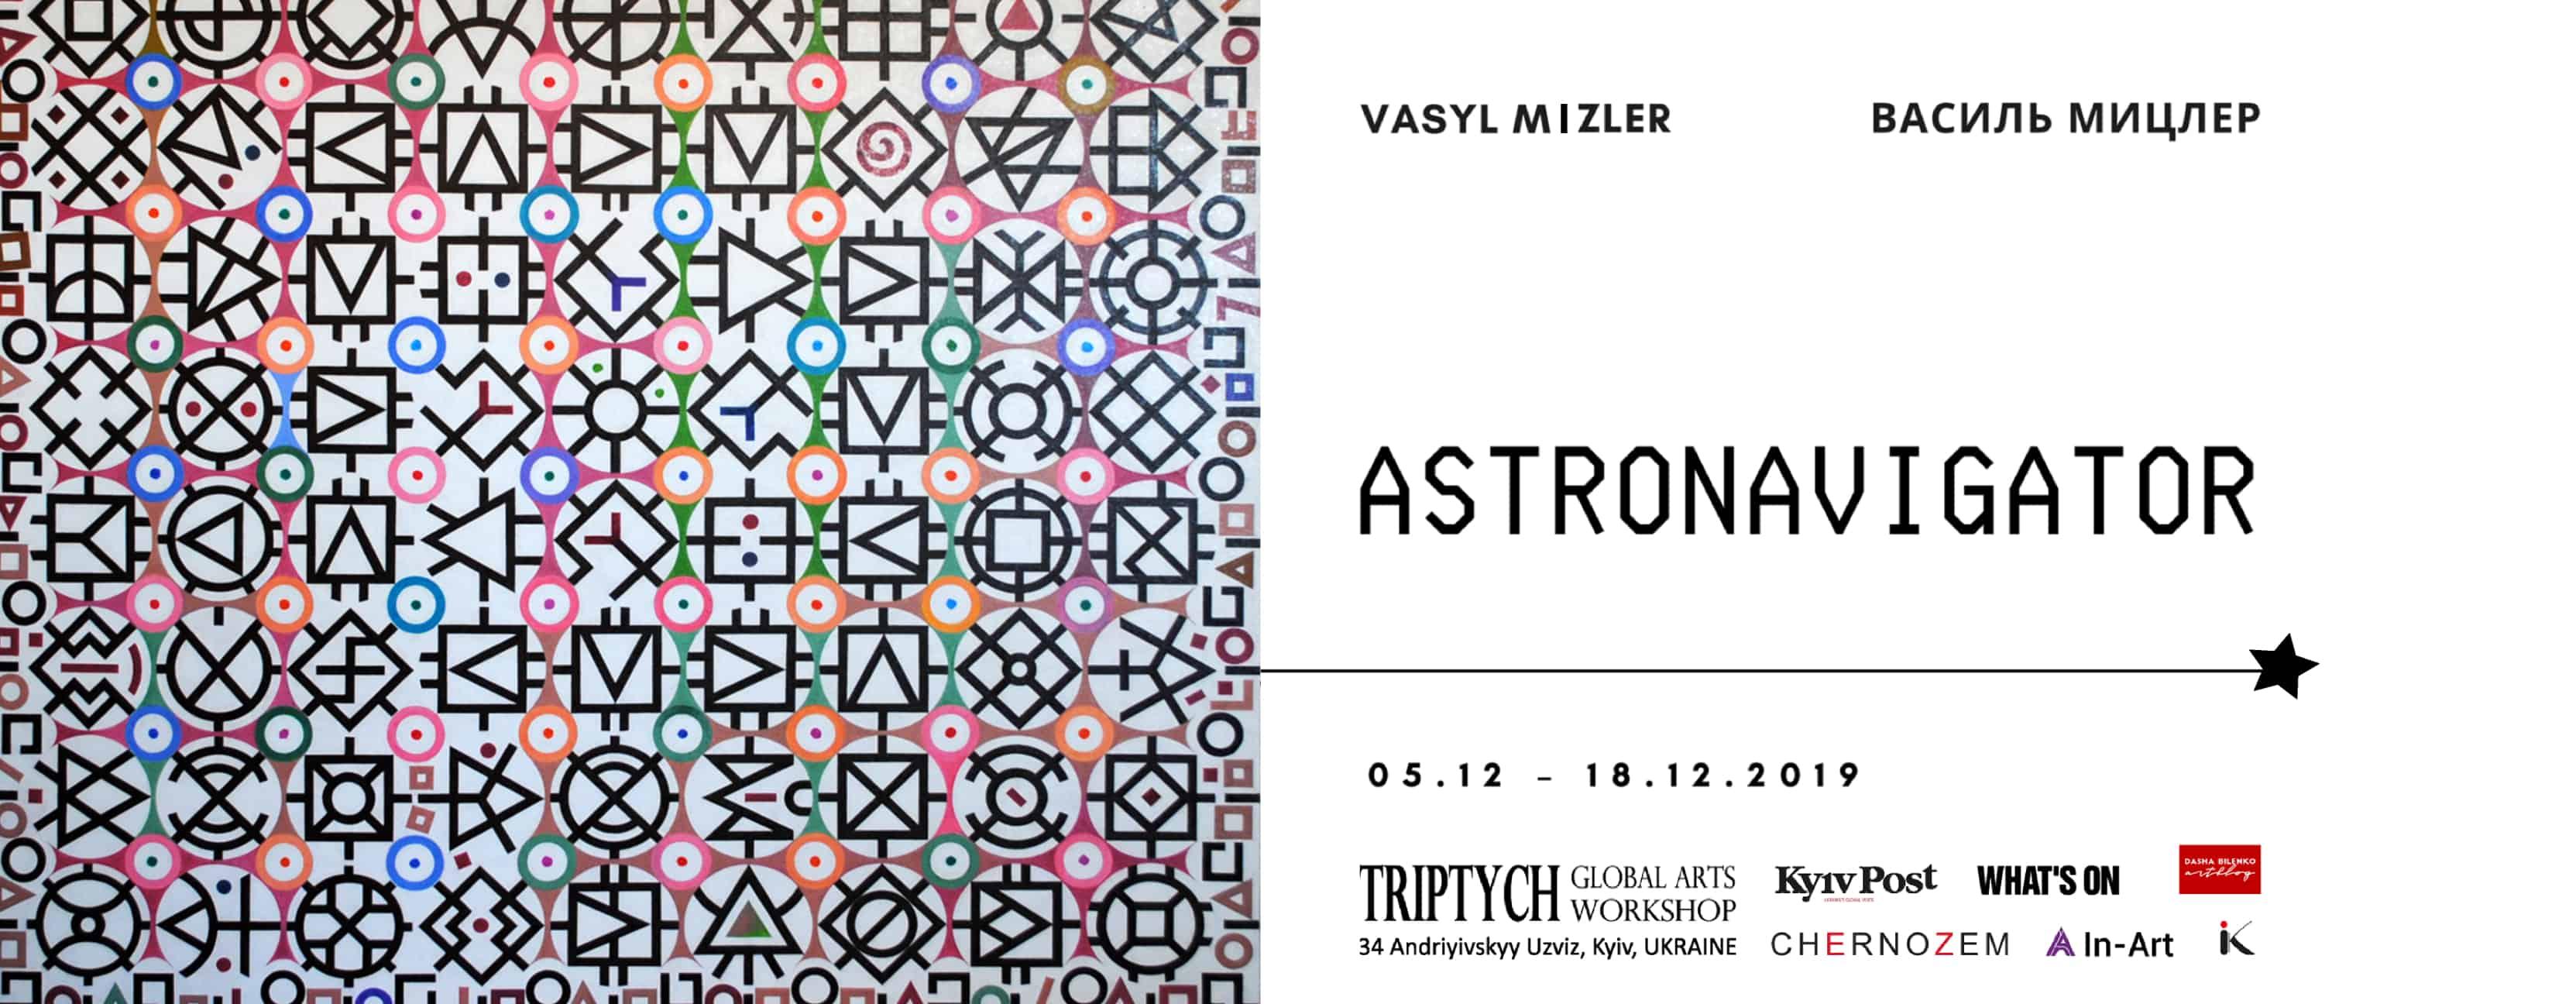 «Астронавігатор» | Triptych: Global Arts Workshop